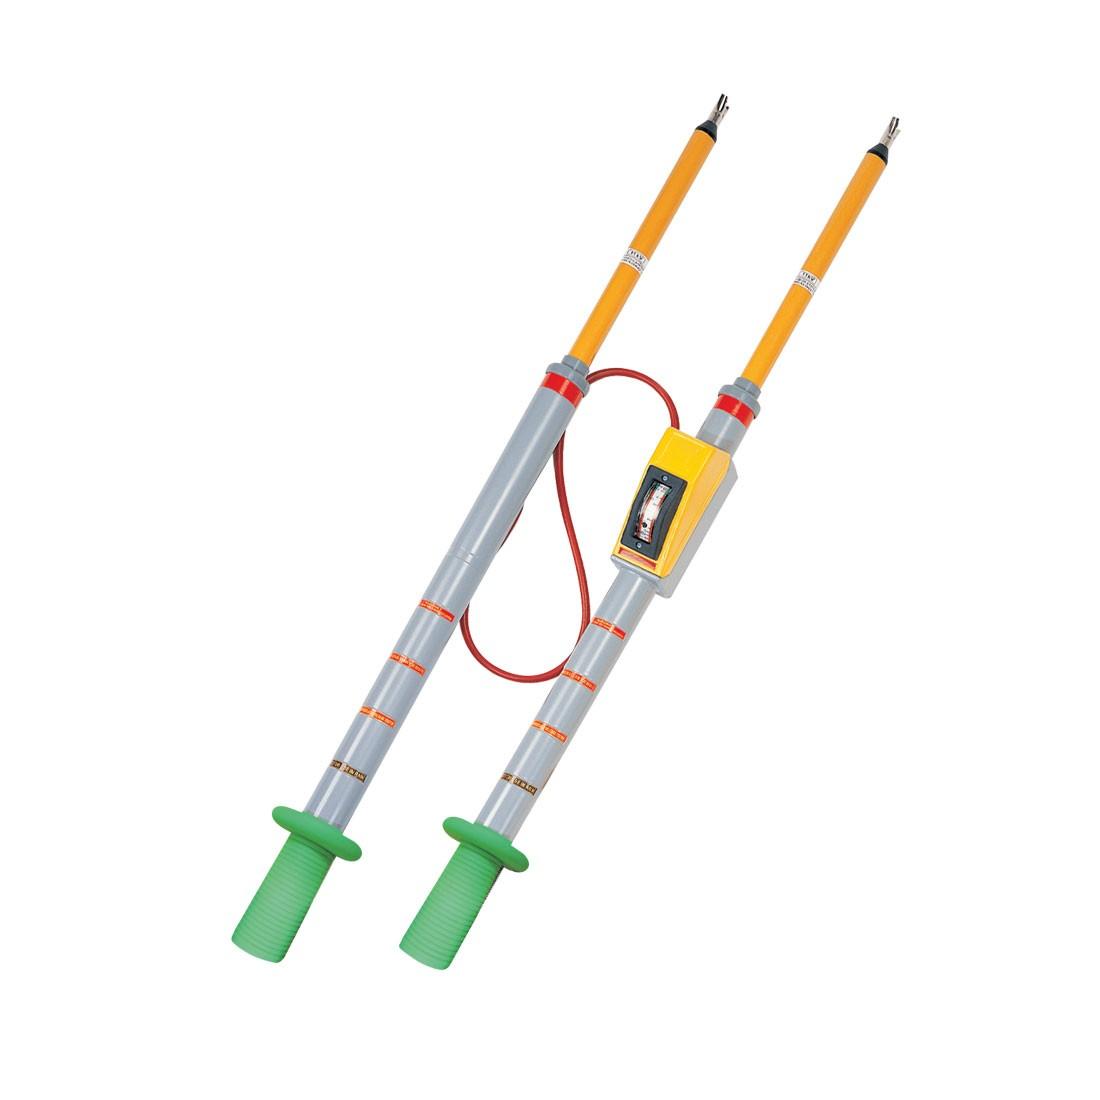 HPC Series High Voltage Multifunction Phasing Sticks